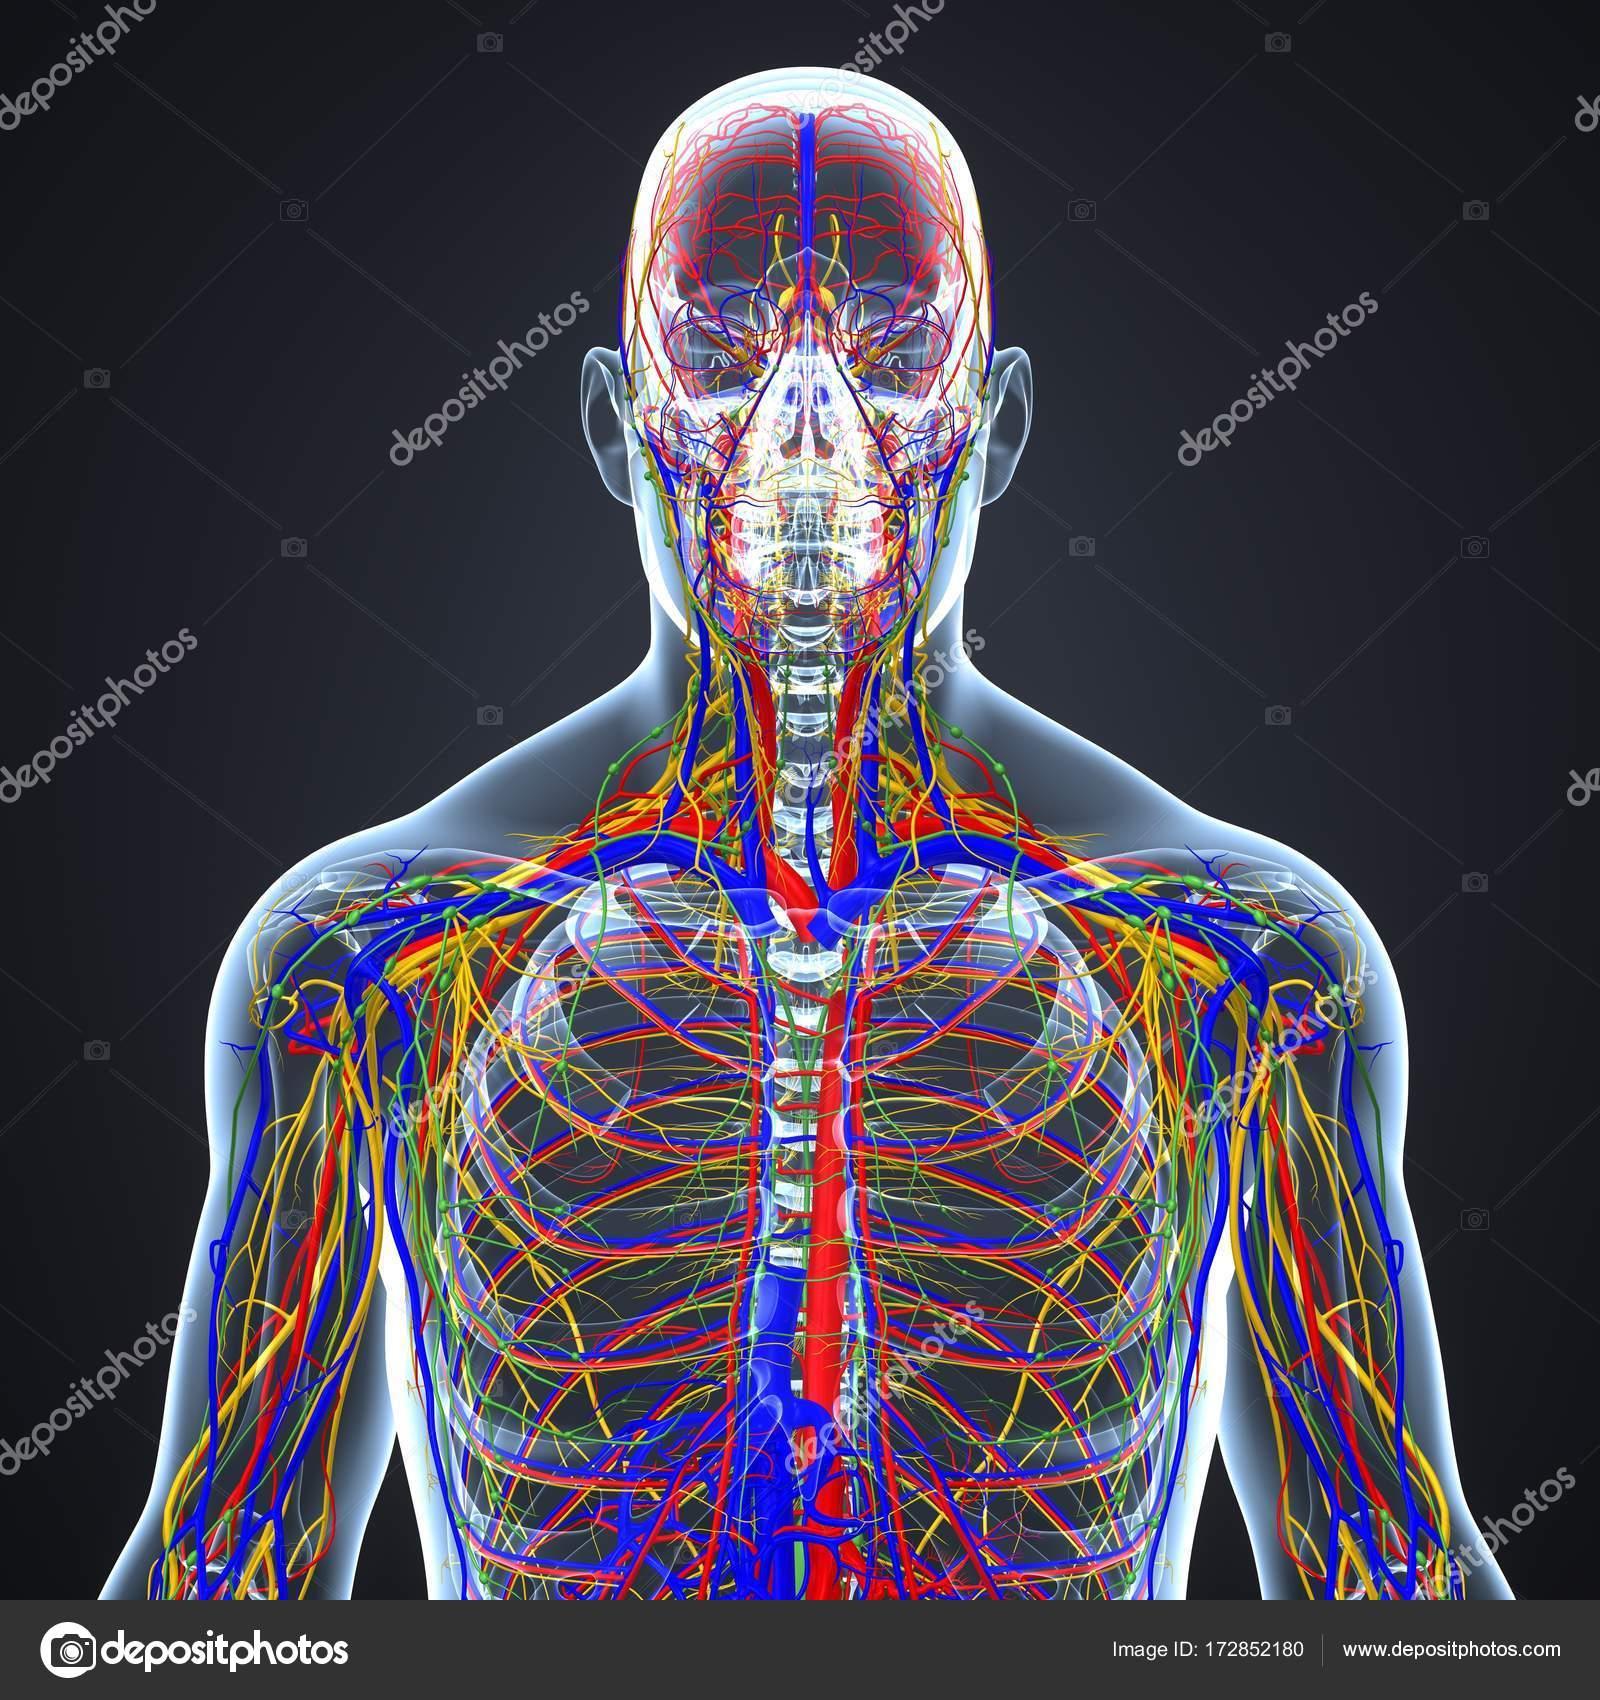 Nervensystem mit Lymphknoten — Stockfoto © sciencepics #172852180